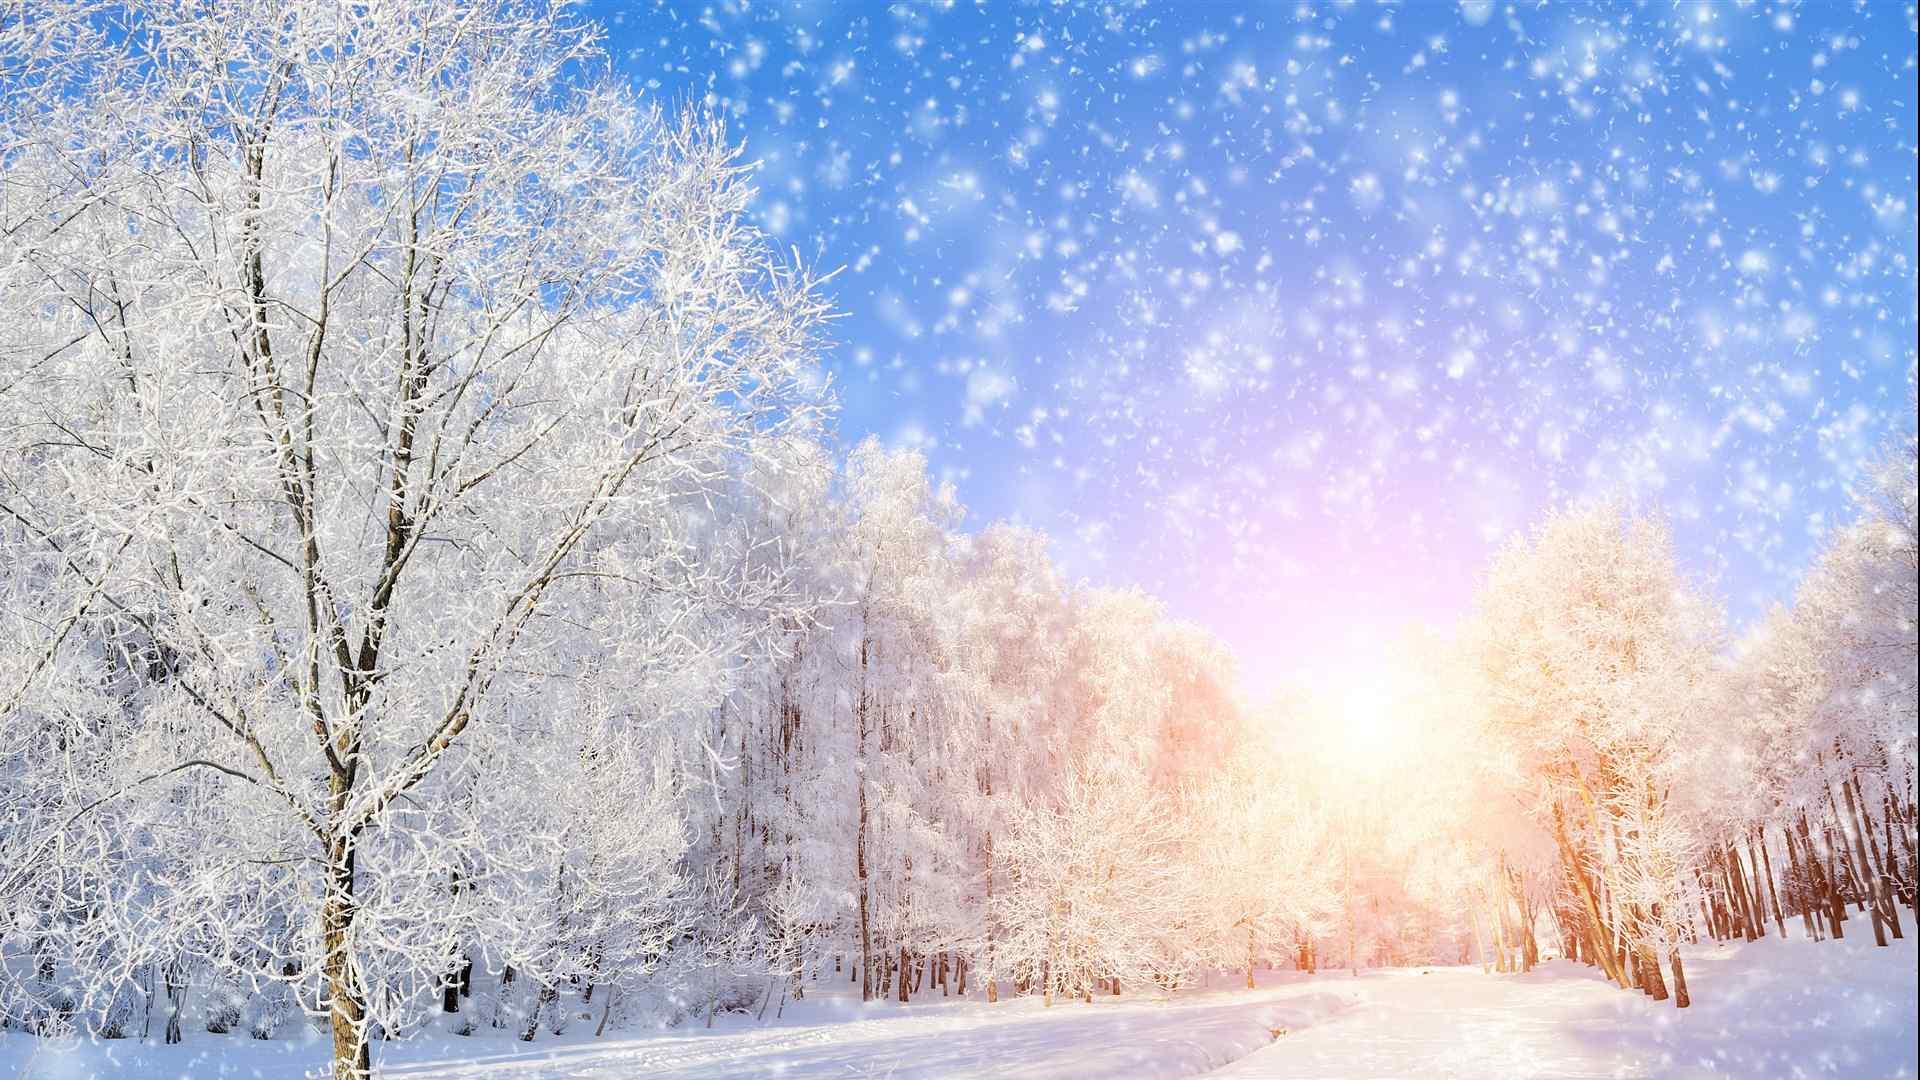 beautiful winter scenery wallpaper